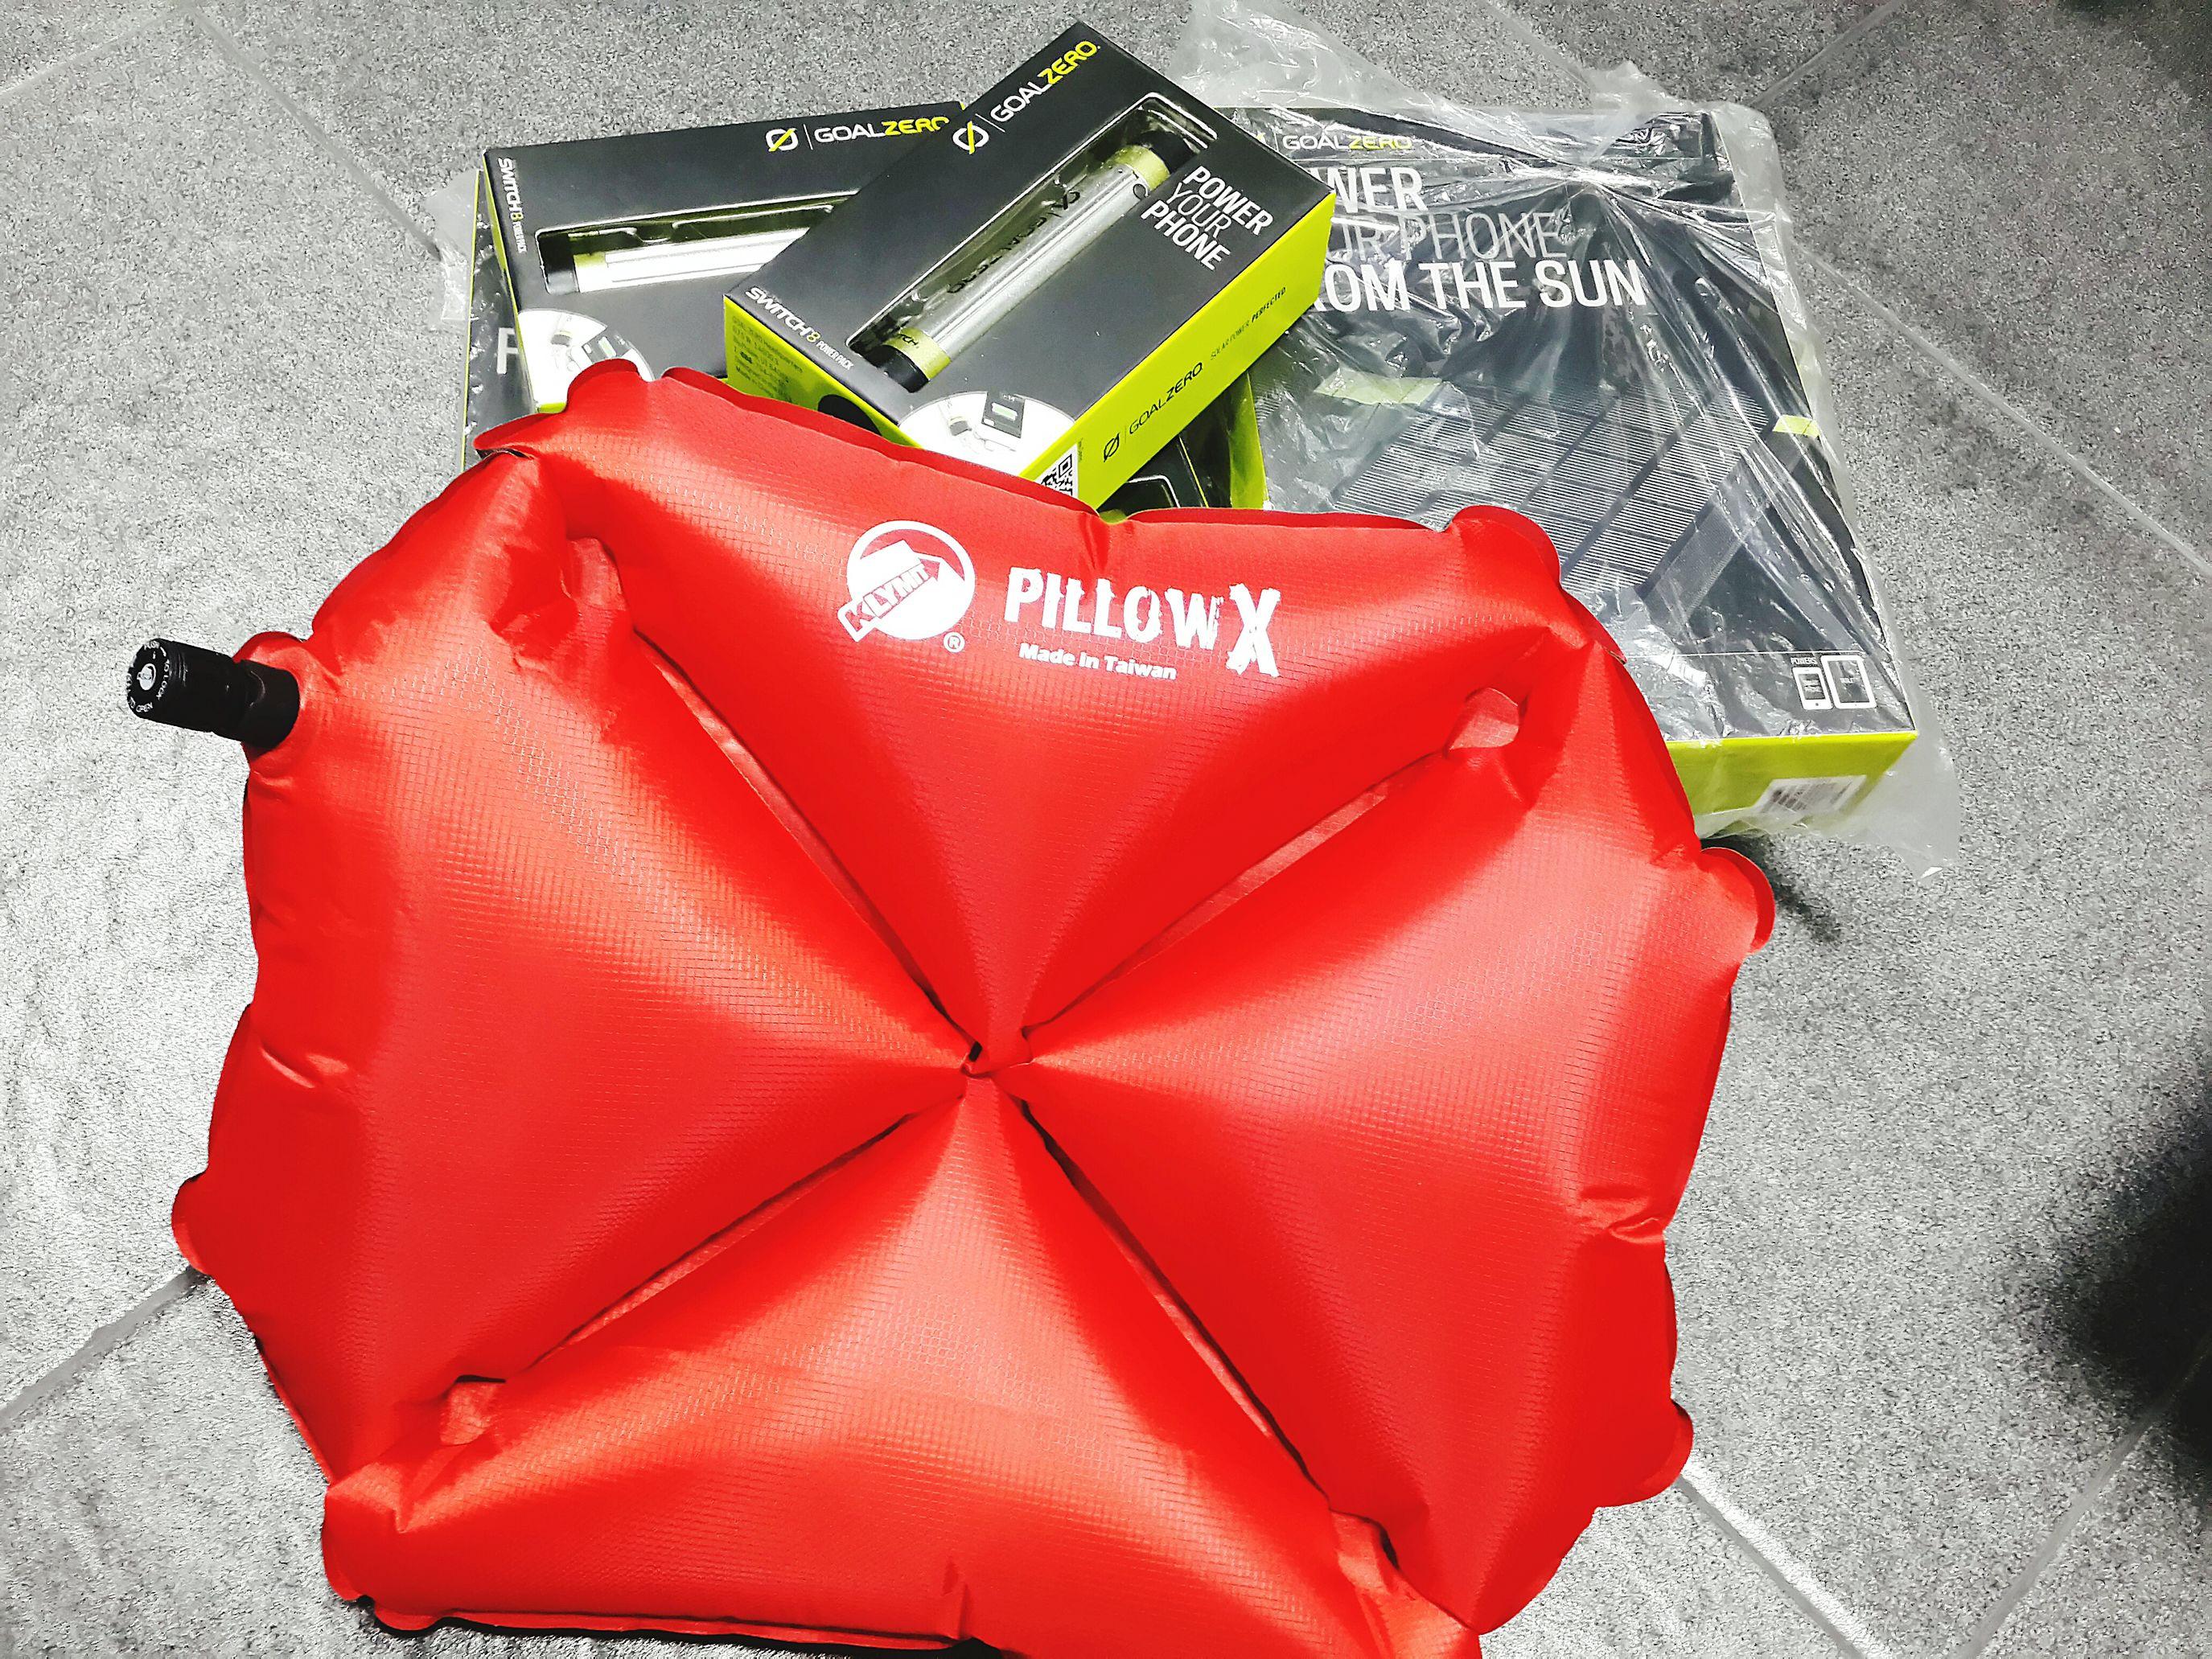 Something you must have, personal equipment.. Bestequipment Goalzero Klymit grab fast !!!?